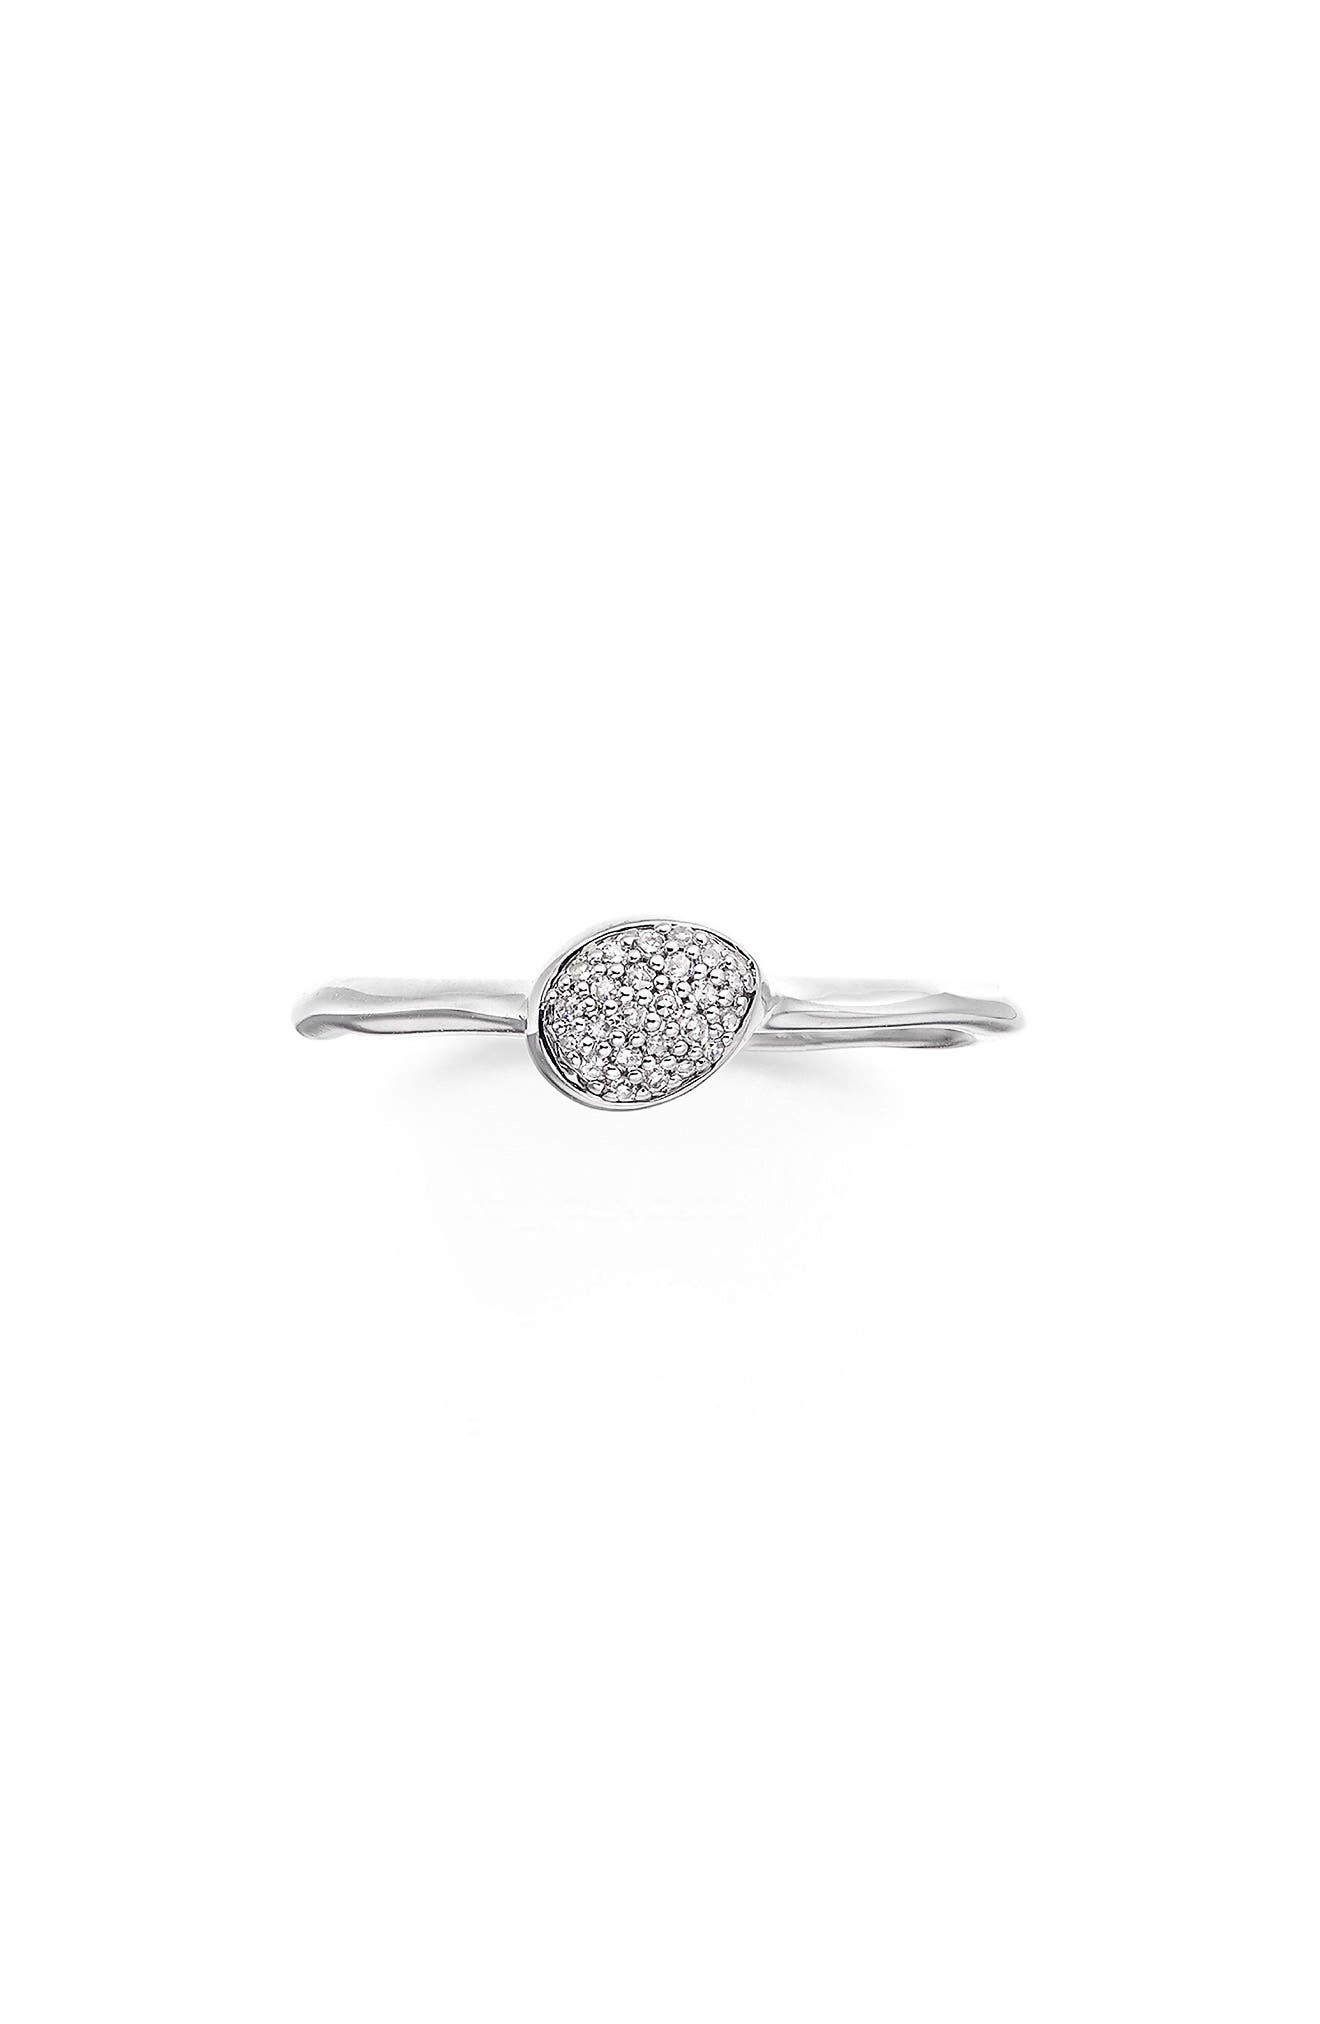 Siren Small Pavé Diamond Stacking Ring,                         Main,                         color, Silver/ Diamond